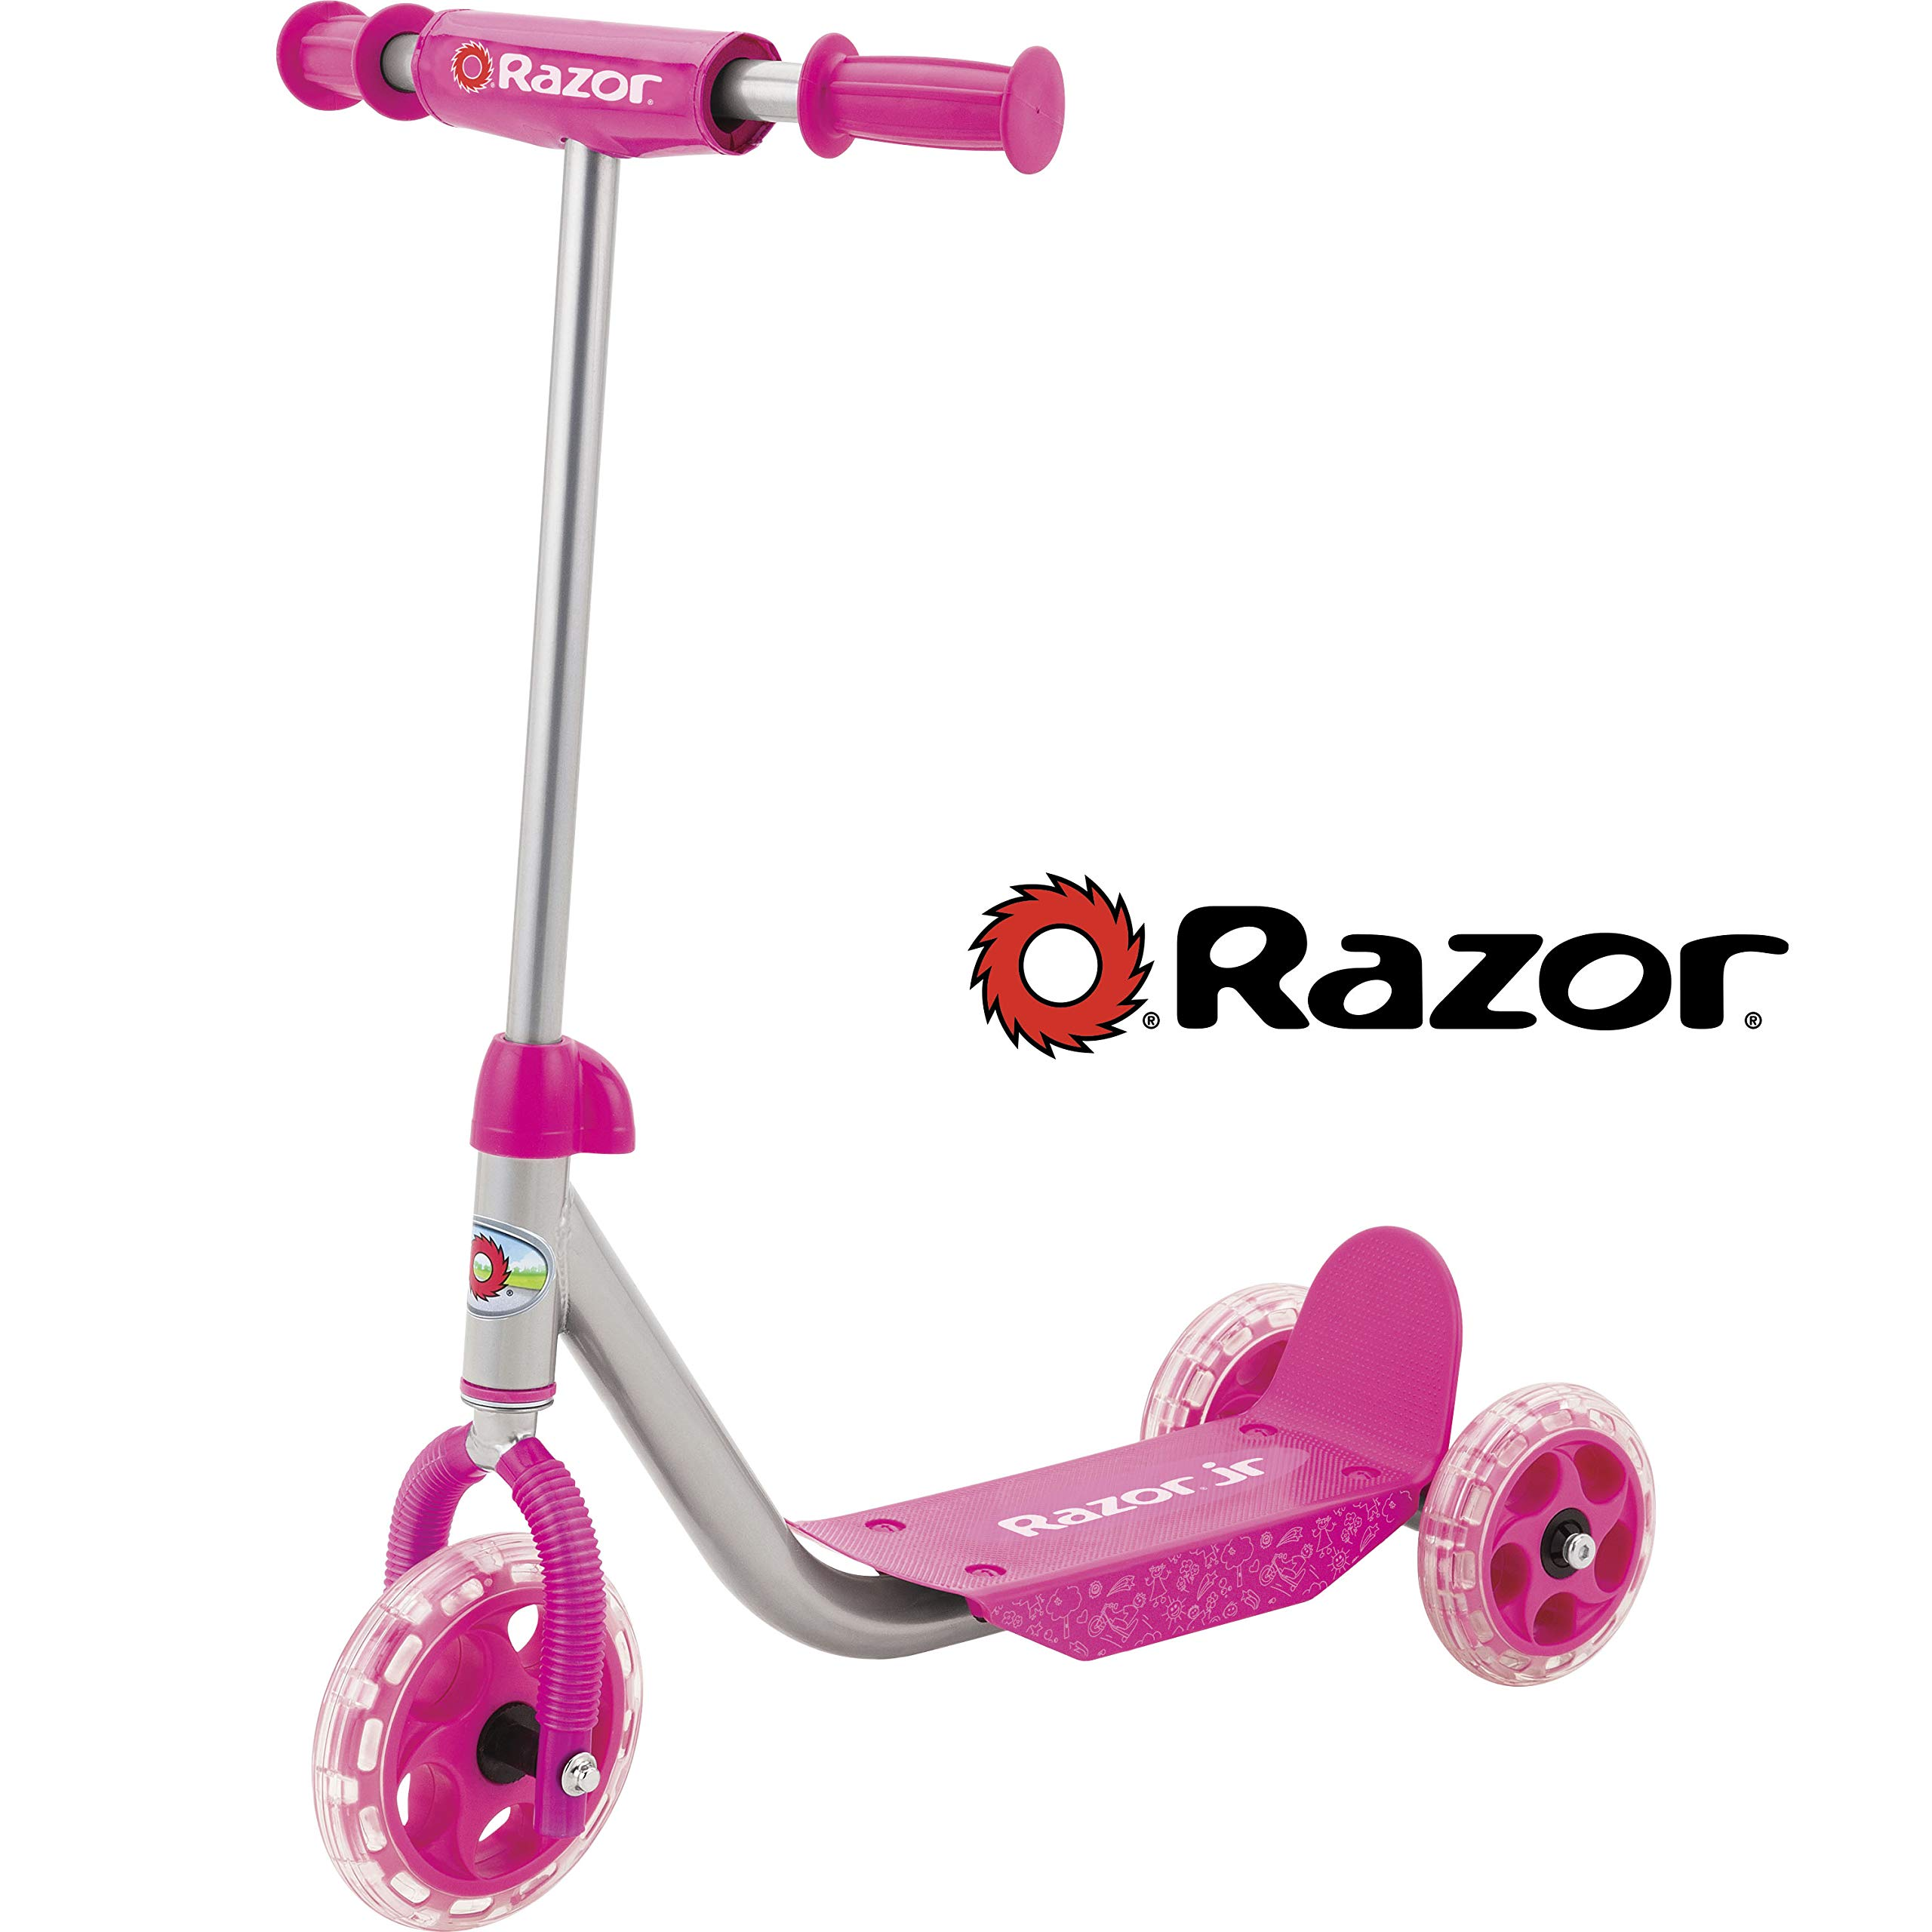 Razor Jr. Lil' Kick Scooter by Razor